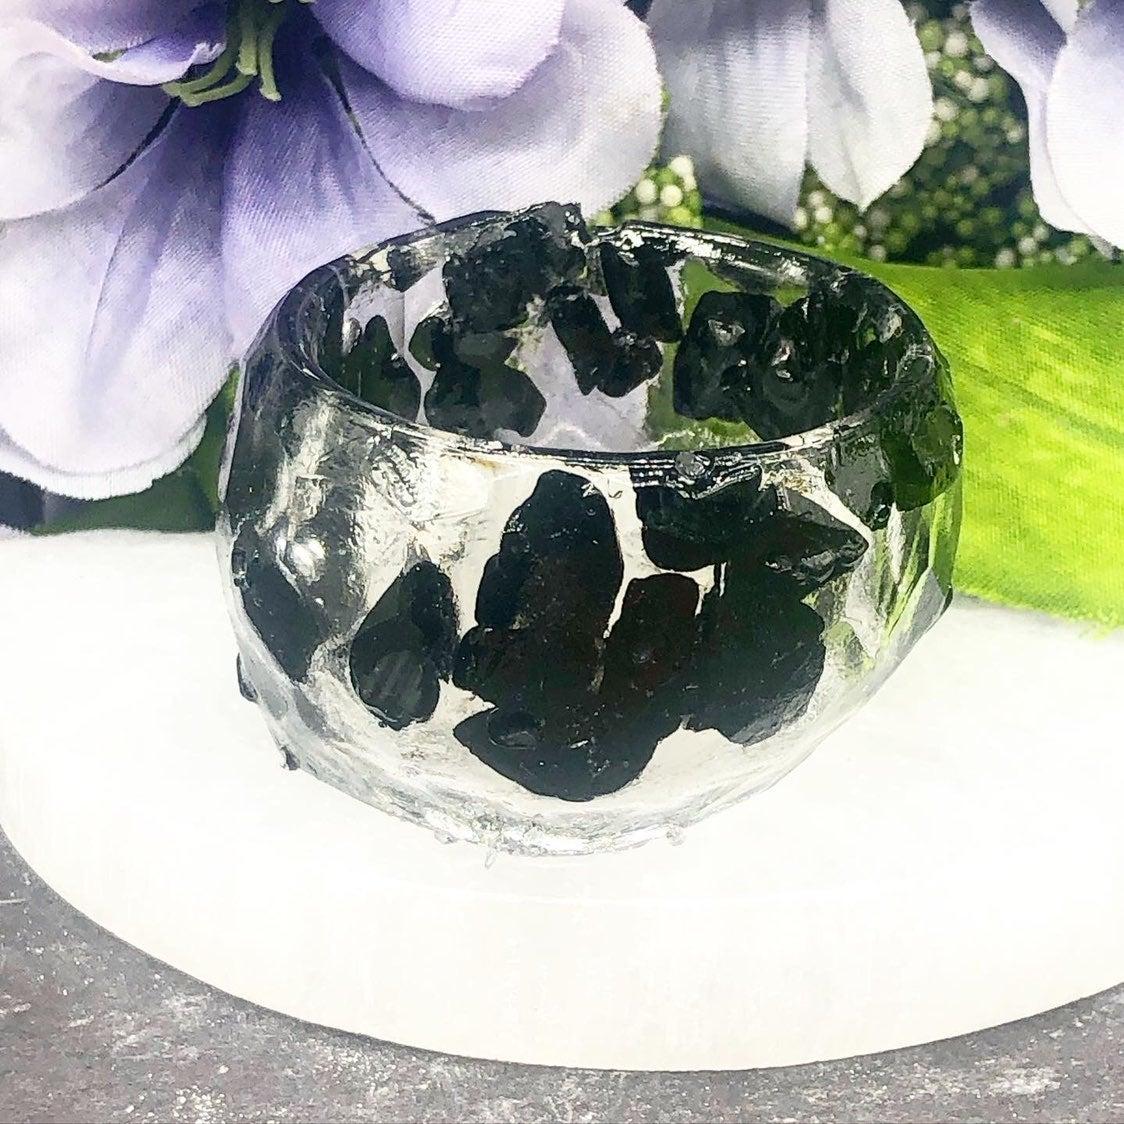 Black tourmaline and resin bowl